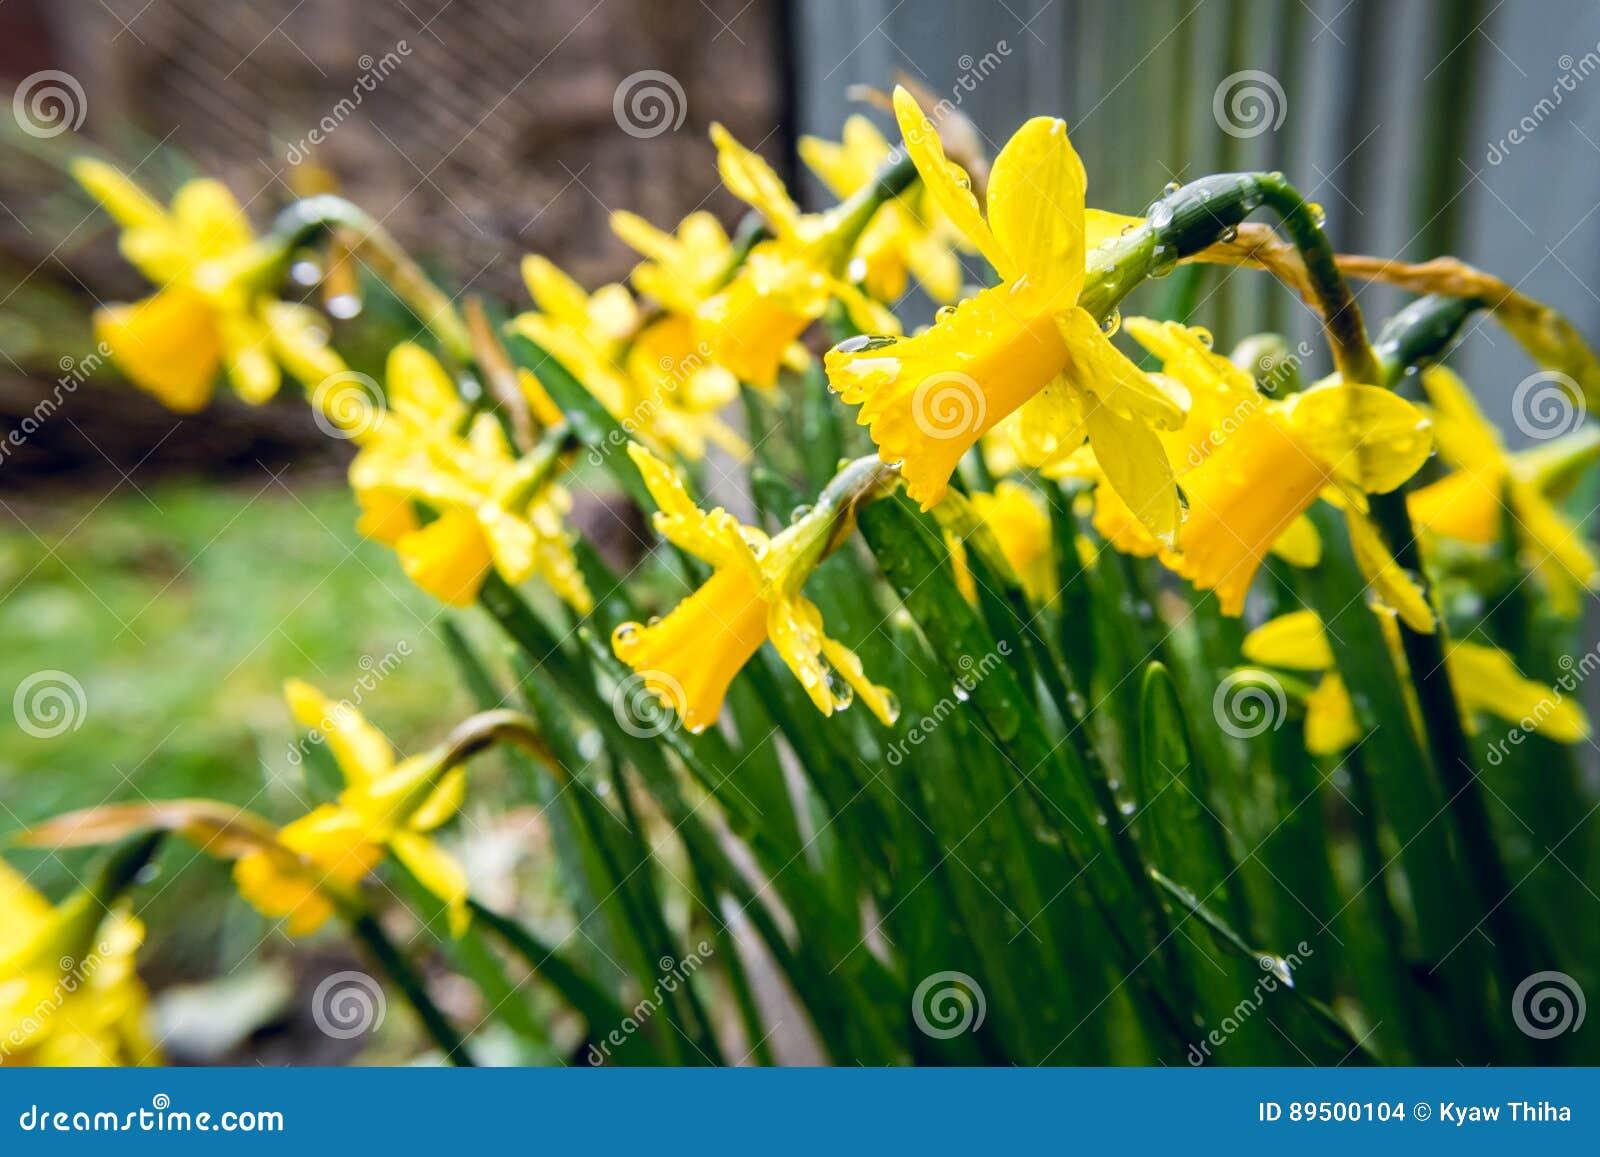 Daffodils Under The Rain In Early Spring In Backyard 3 Stock Photo